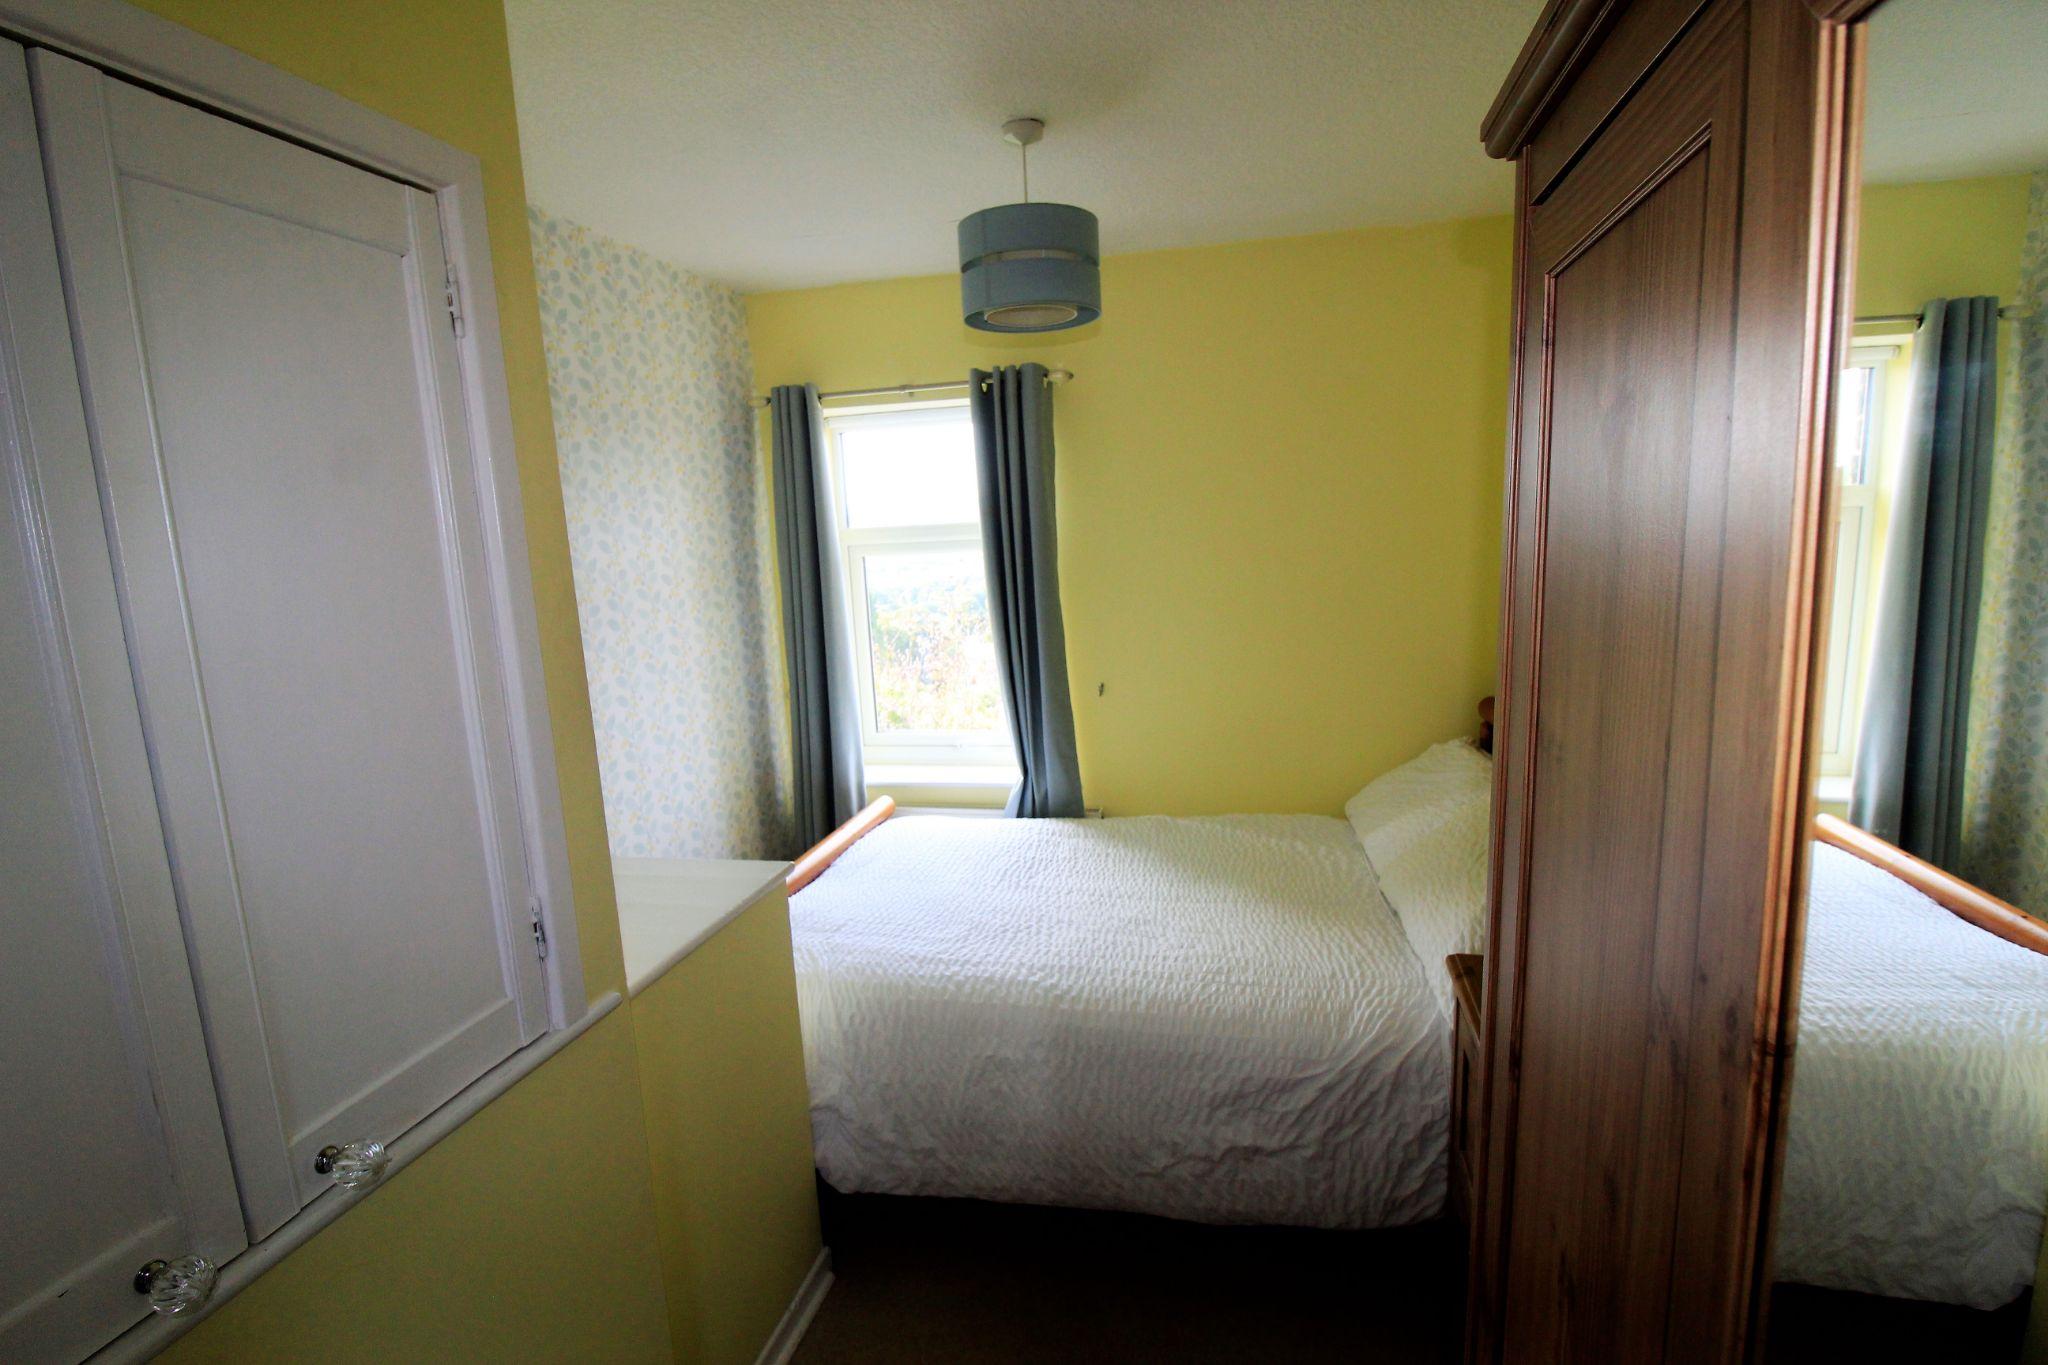 2 bedroom cottage house SSTC in Huddersfield - Bedroom 2